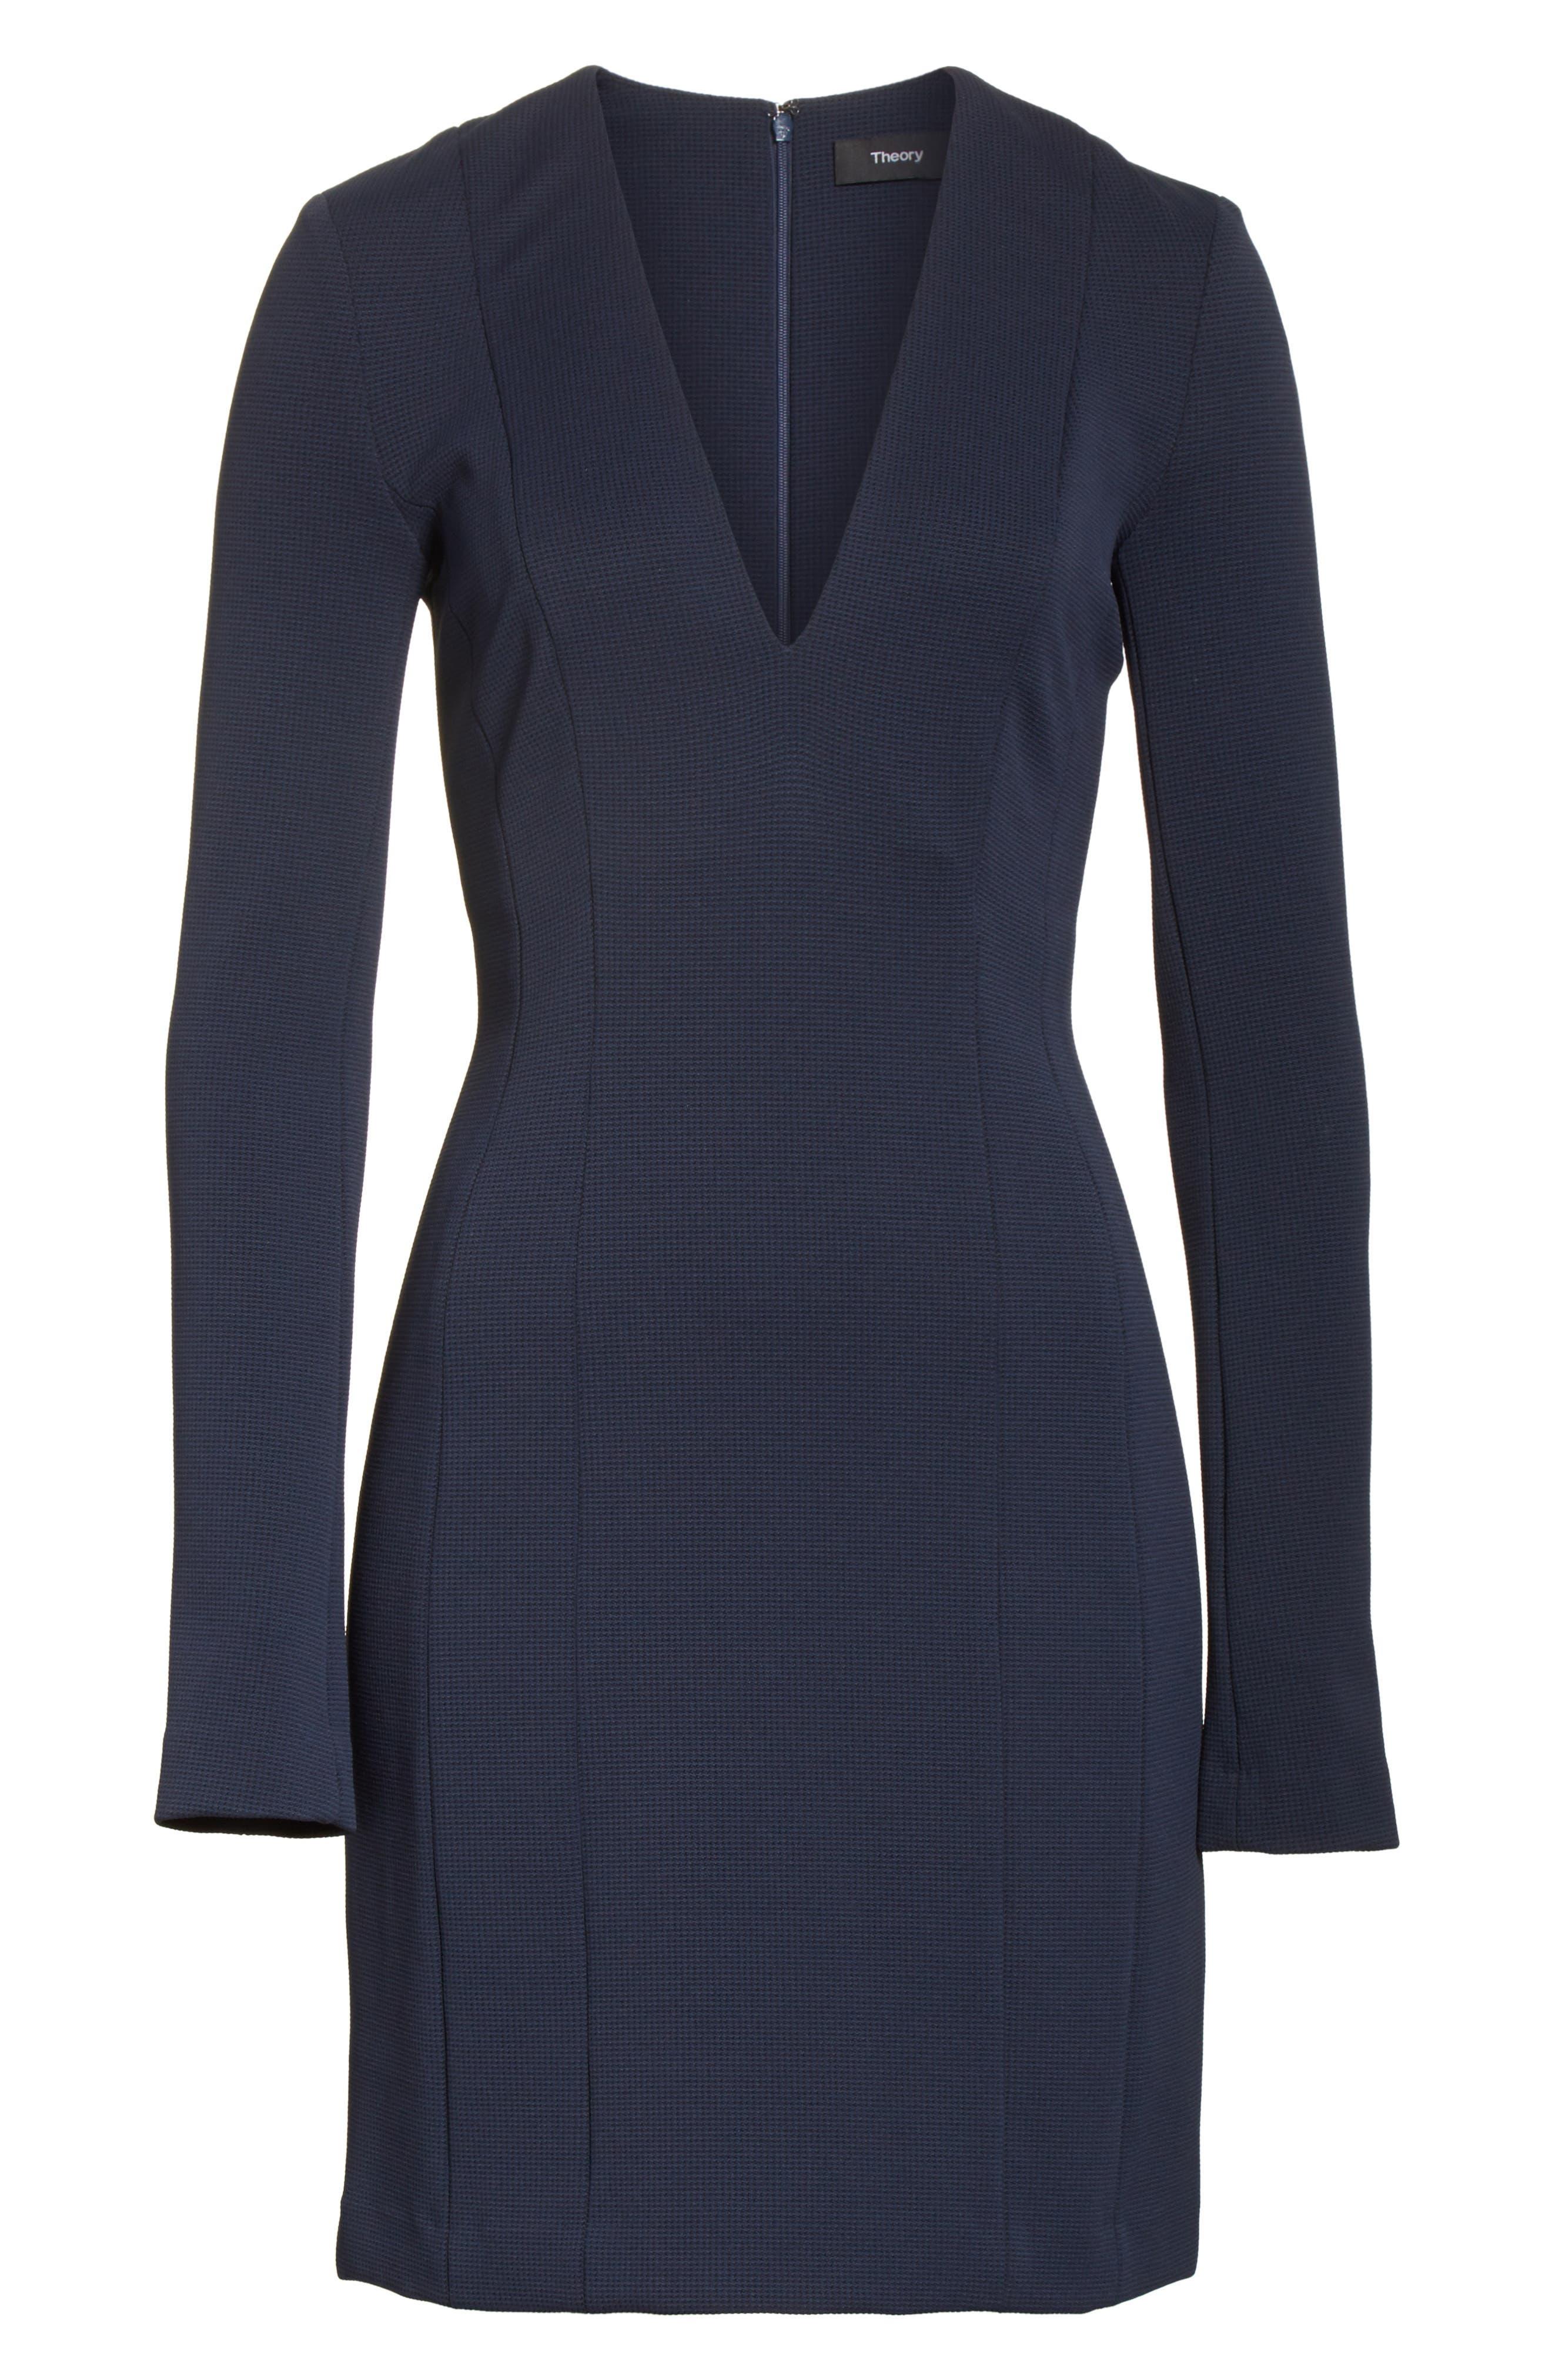 Tuscon Knit A-Line Dress,                             Alternate thumbnail 6, color,                             491